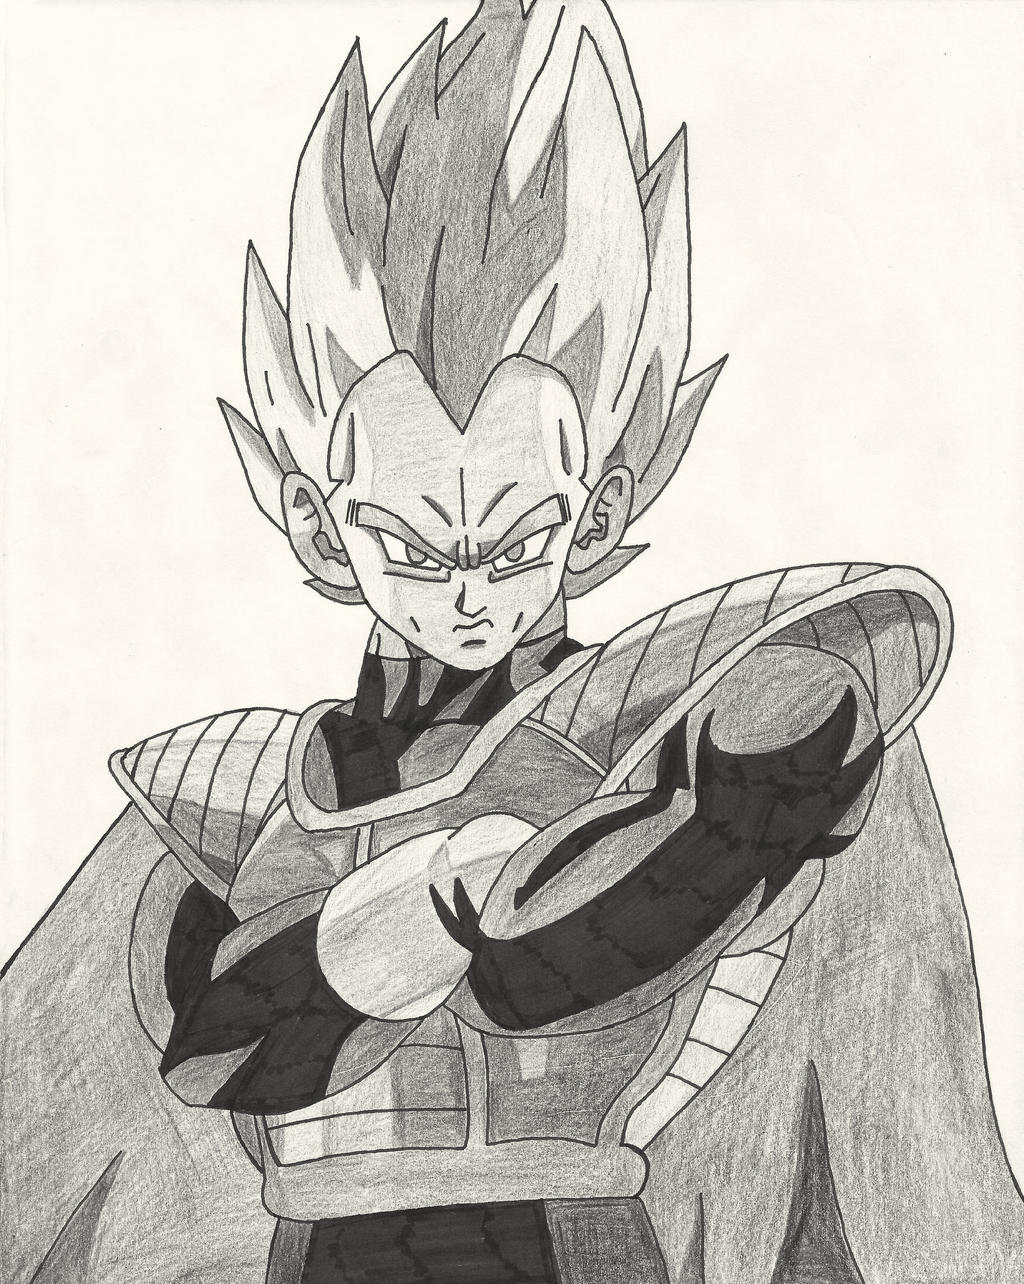 Fanart: Lord Vegeta (pencil) by bringerofdeathDBZ on ... - photo#18